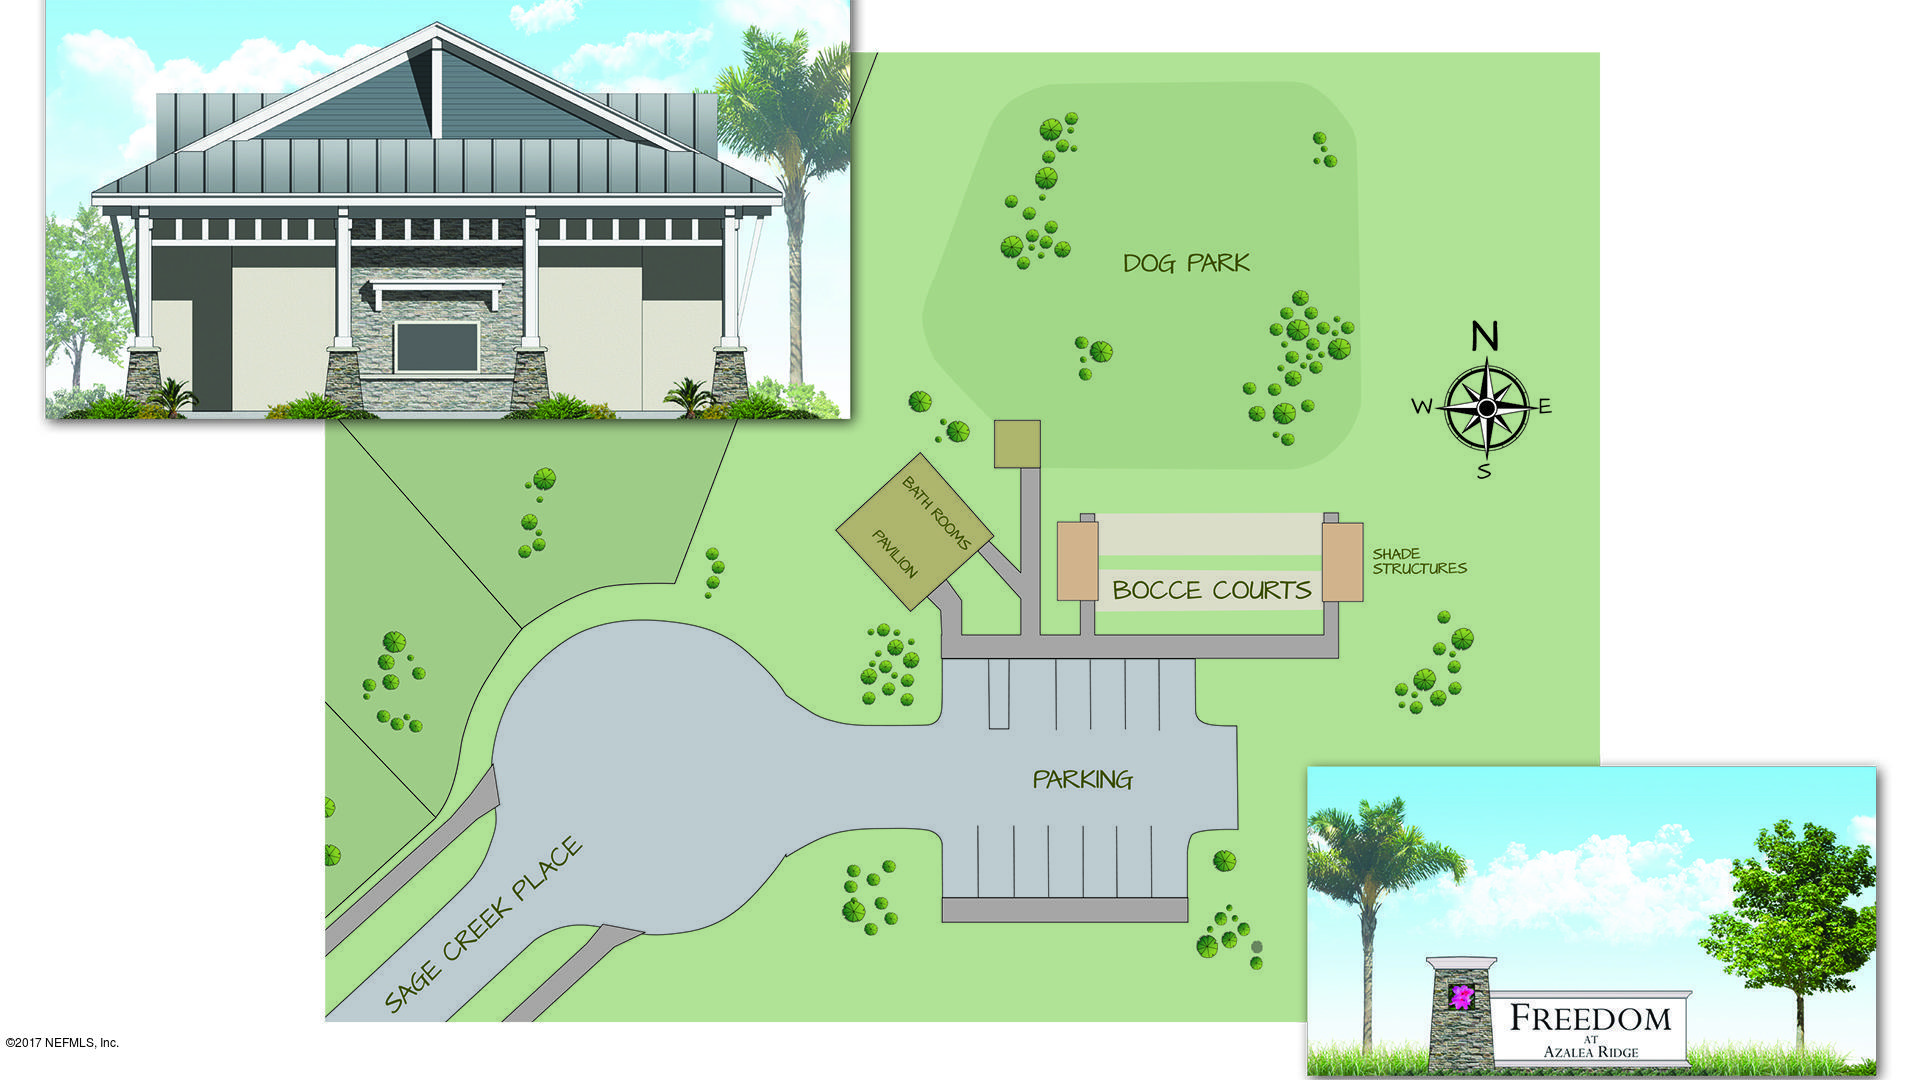 4048 SPRING CREEK, MIDDLEBURG, FLORIDA 32068, 3 Bedrooms Bedrooms, ,3 BathroomsBathrooms,Residential,For sale,SPRING CREEK,1047540